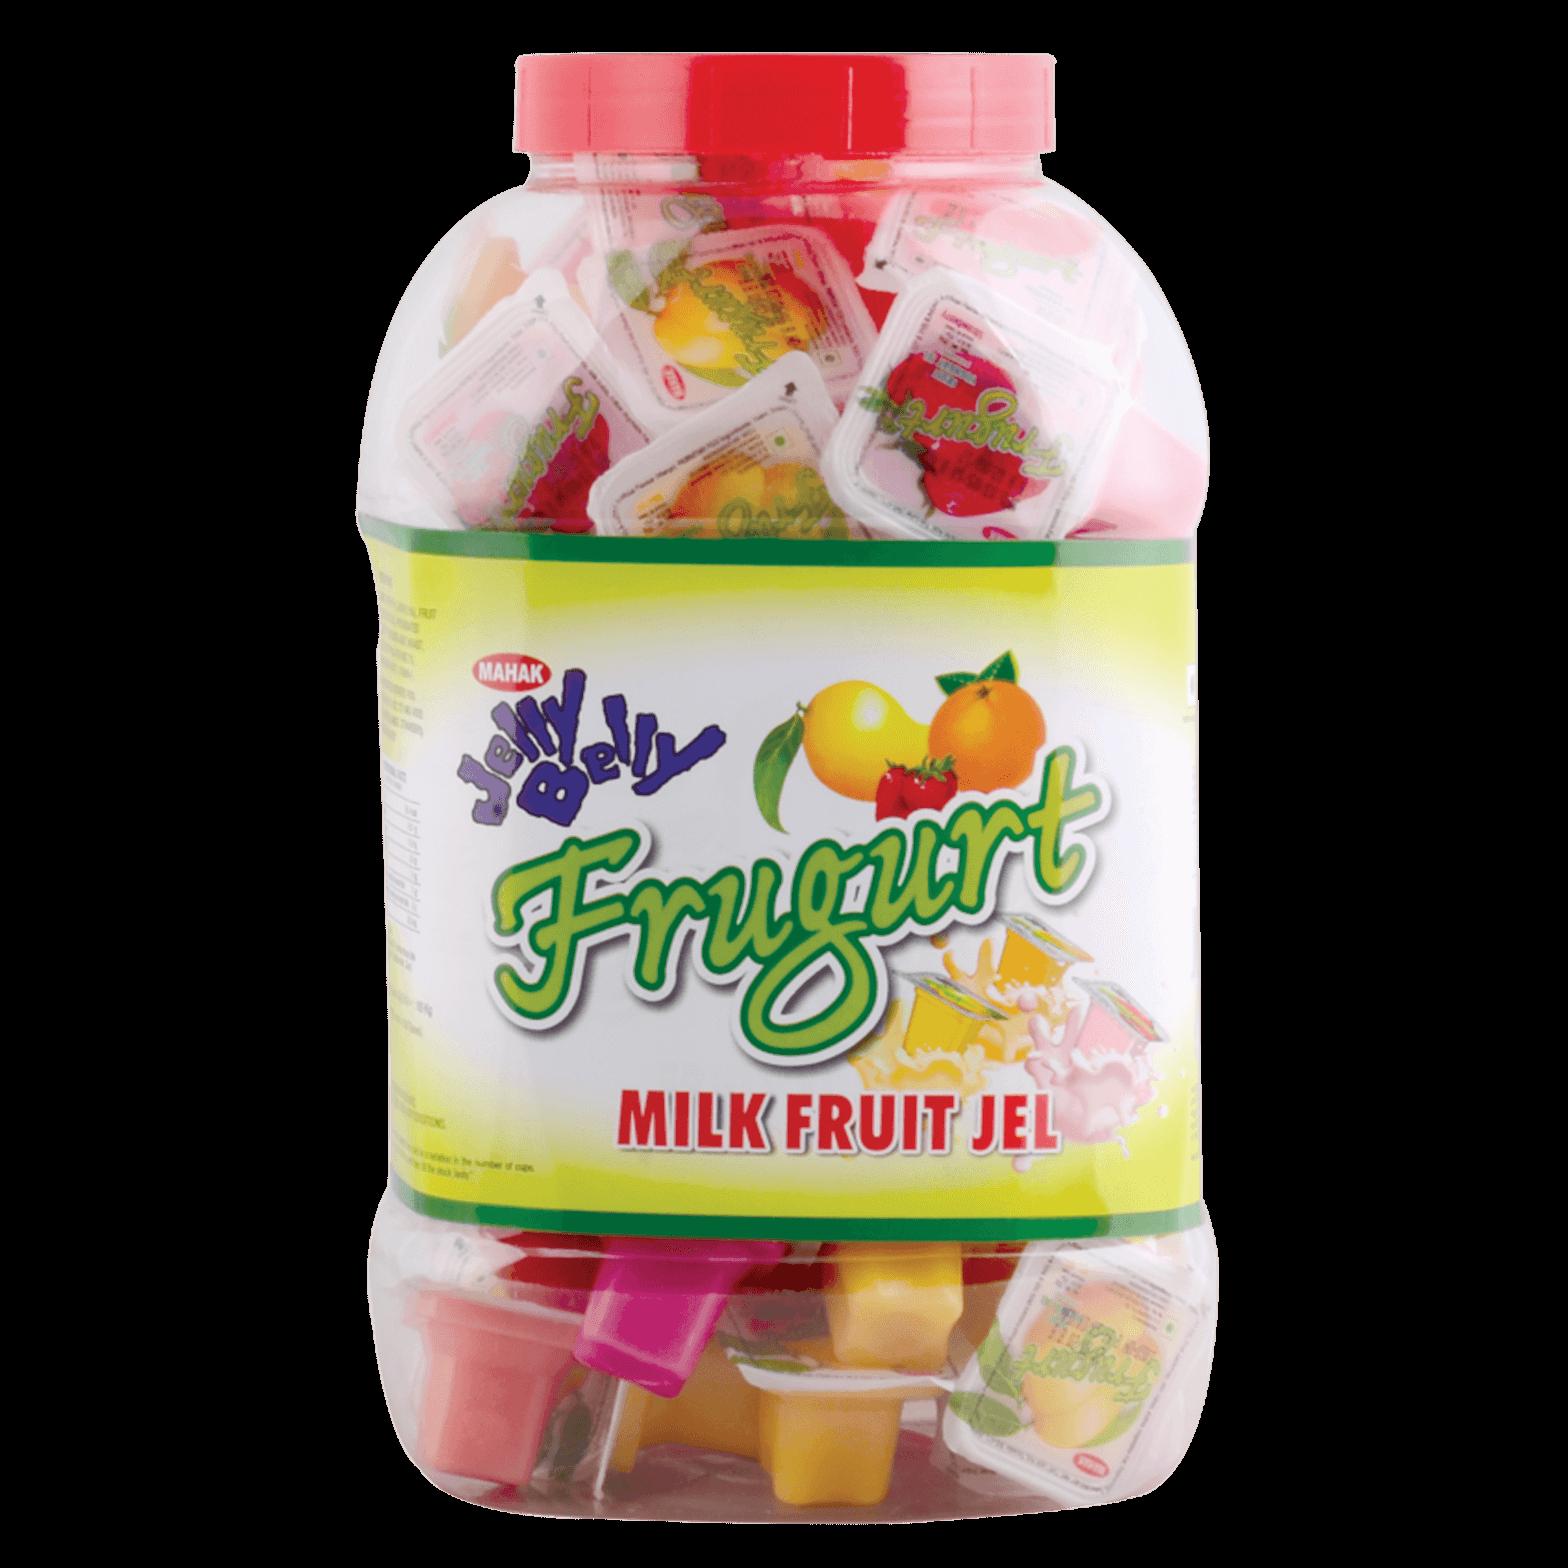 Mahak Jelly Belly Frugurt Milk Fruit Jel